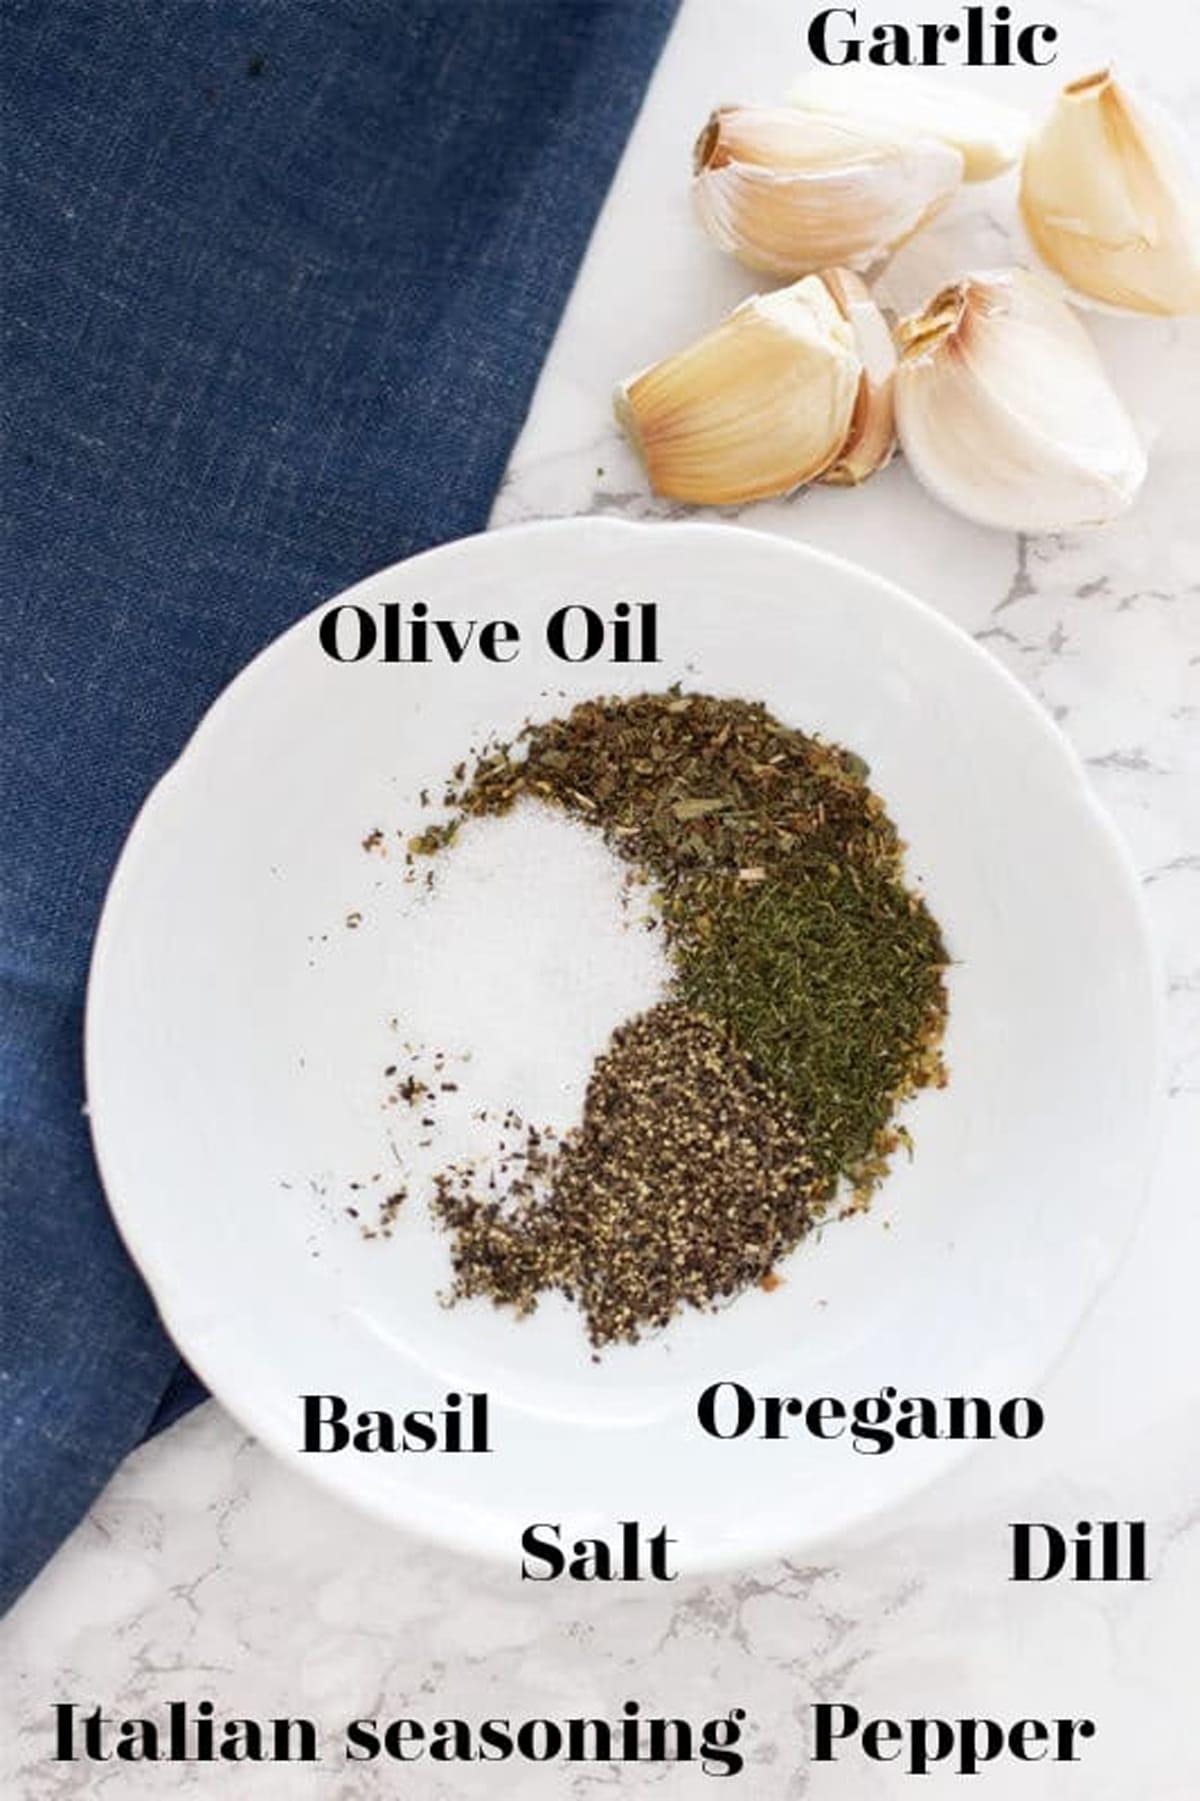 White bowl containing basil, salt, oregano, dill, Italian Seasoning, pepper, olive oil, and garlic cloves.